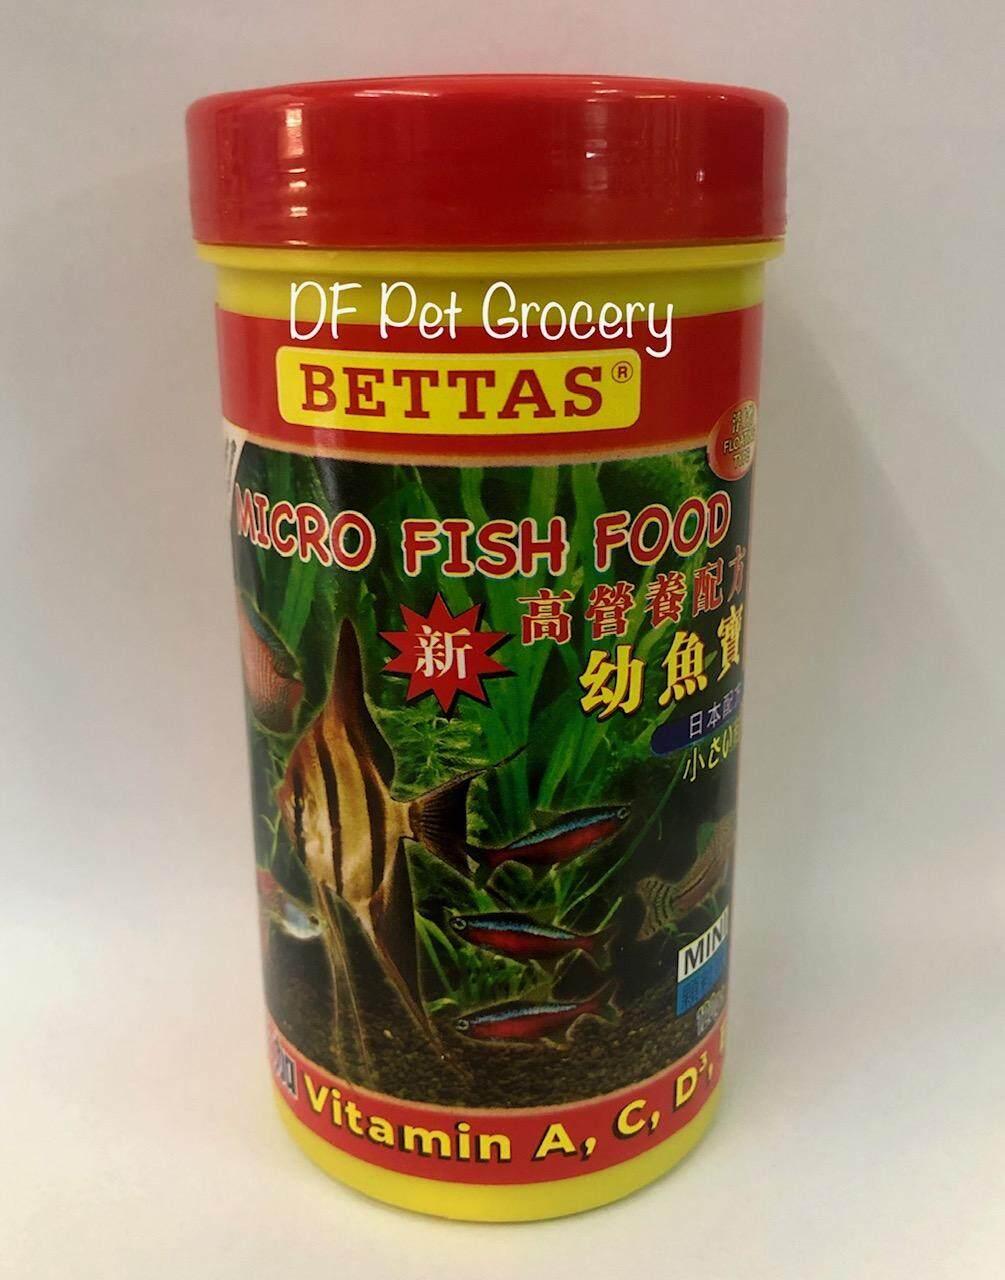 Bettas Micro Fish Food 120gm - Fish Food